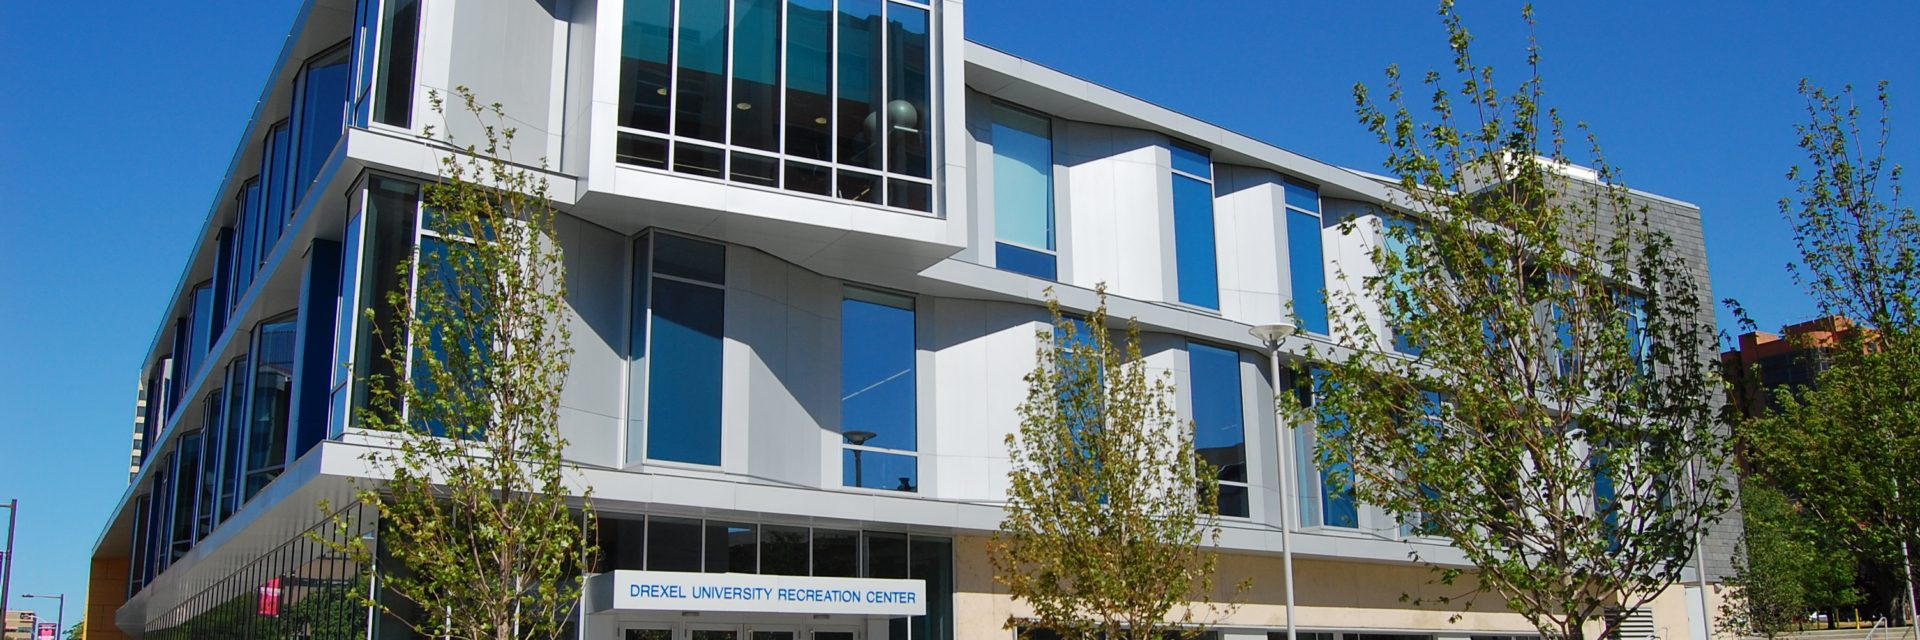 Drexel University Recreation Center